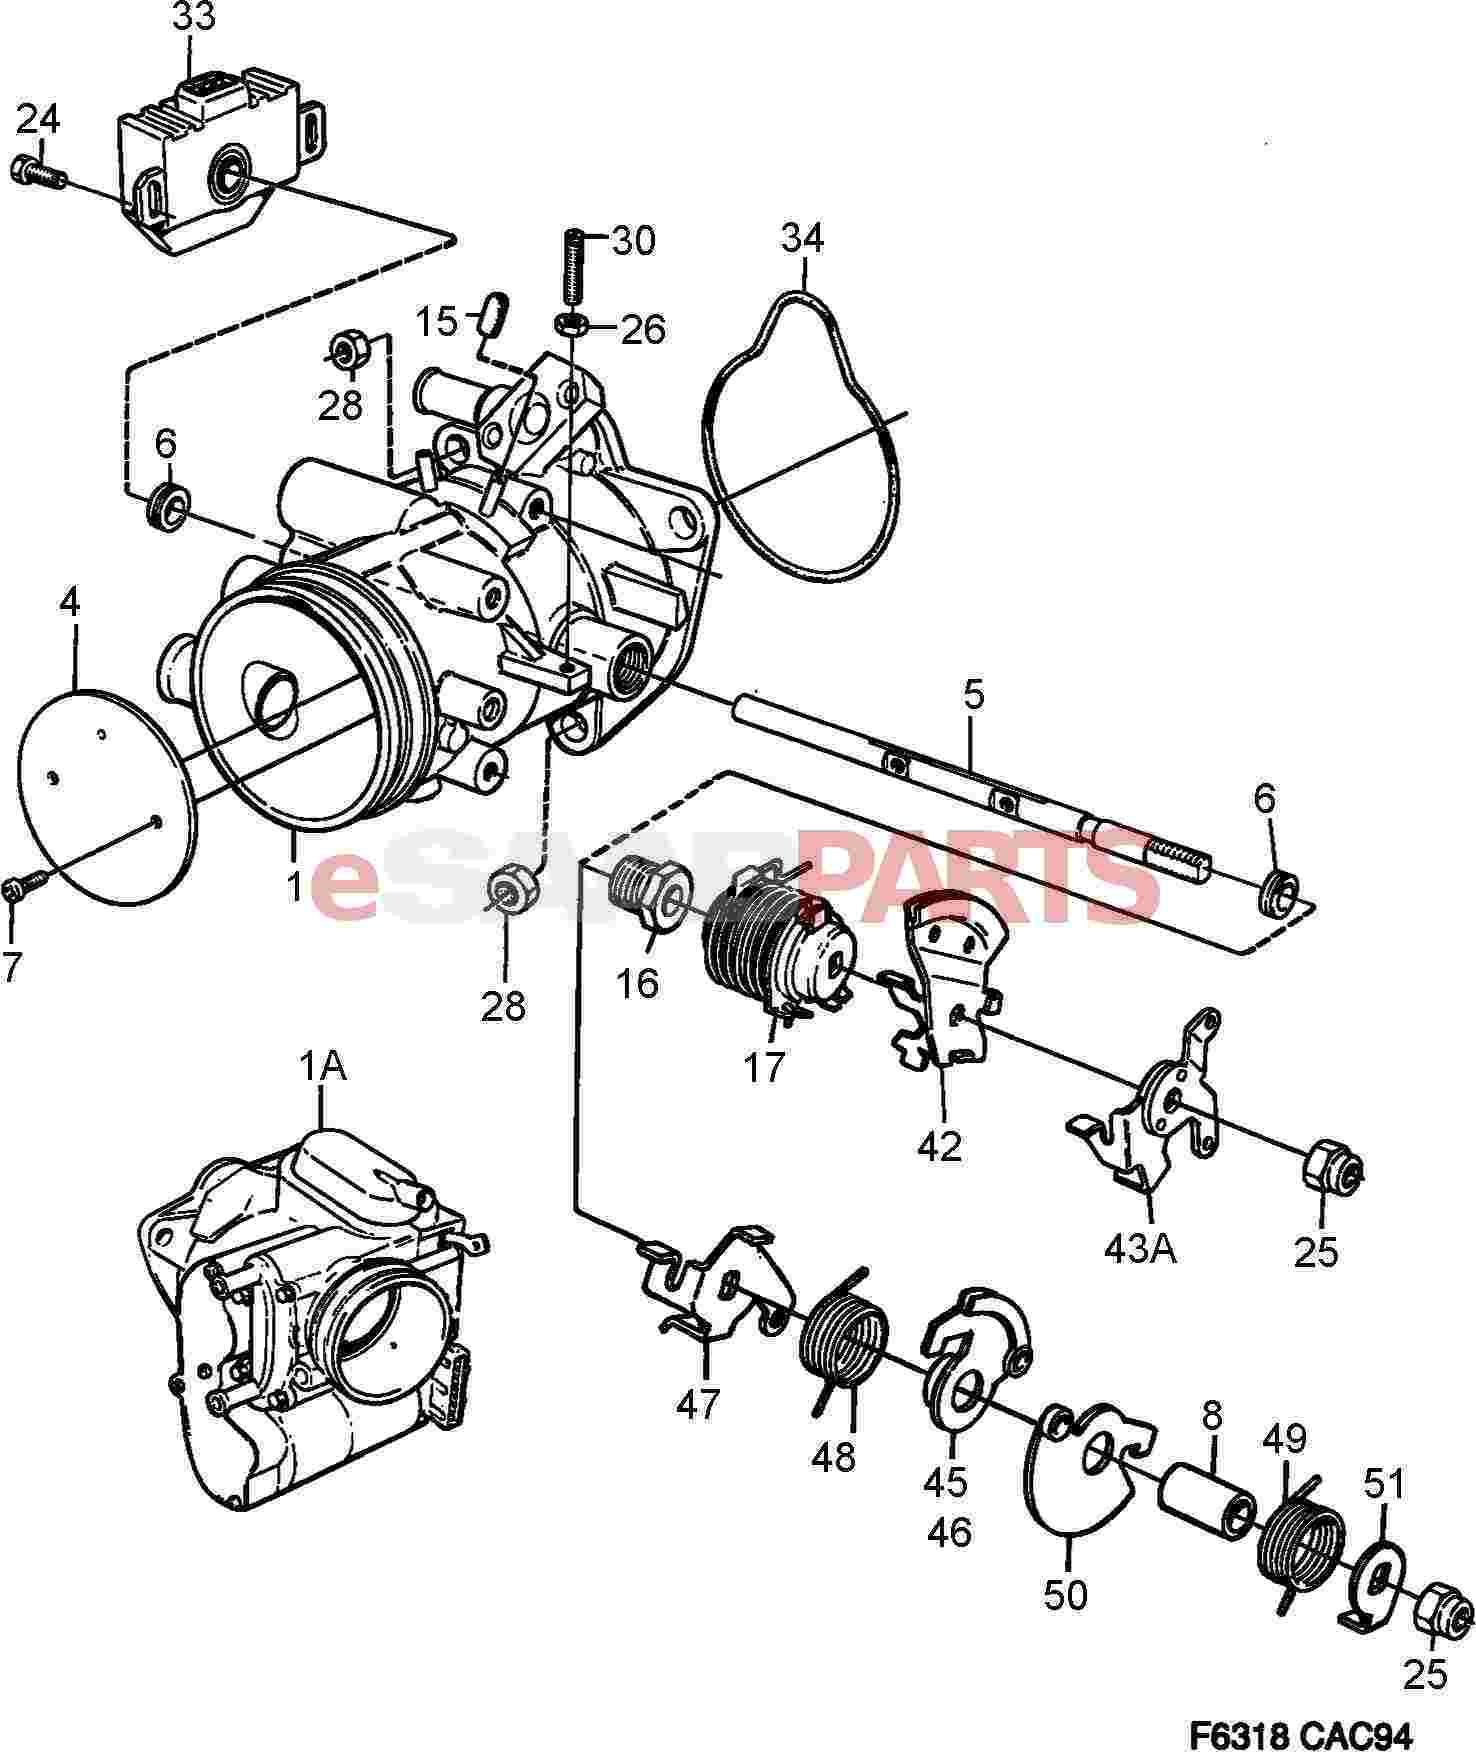 Saab 900 ignition switch wiring diagram